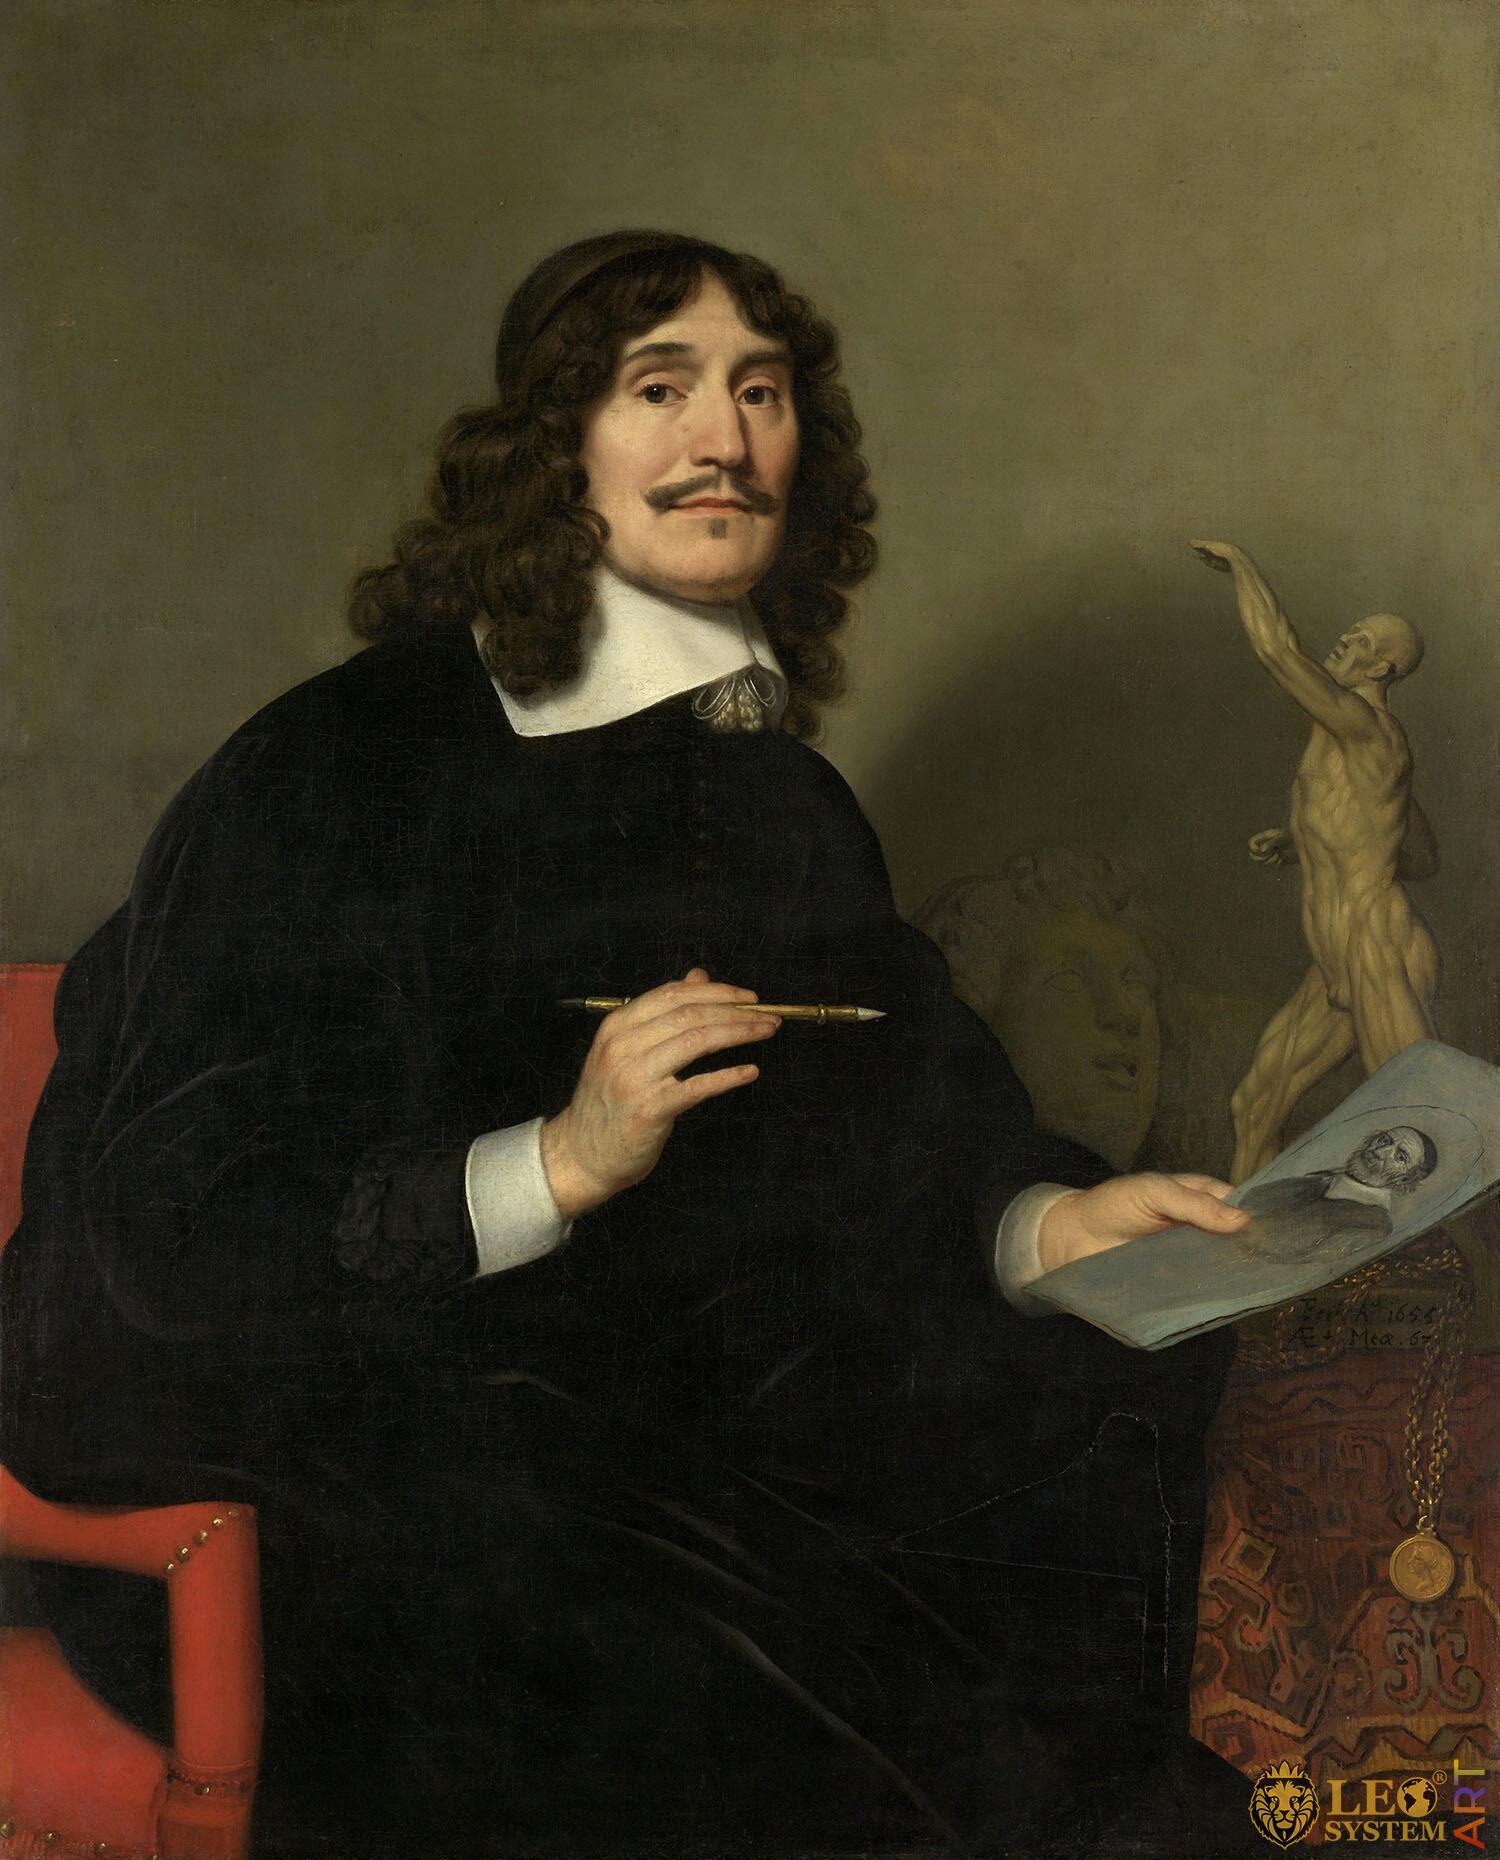 Self-Portrait of an Artist, Gerard van Honthorst, Painter: Gerard van Honthorst, 1655, Amsterdam, Netherlands, Original painting